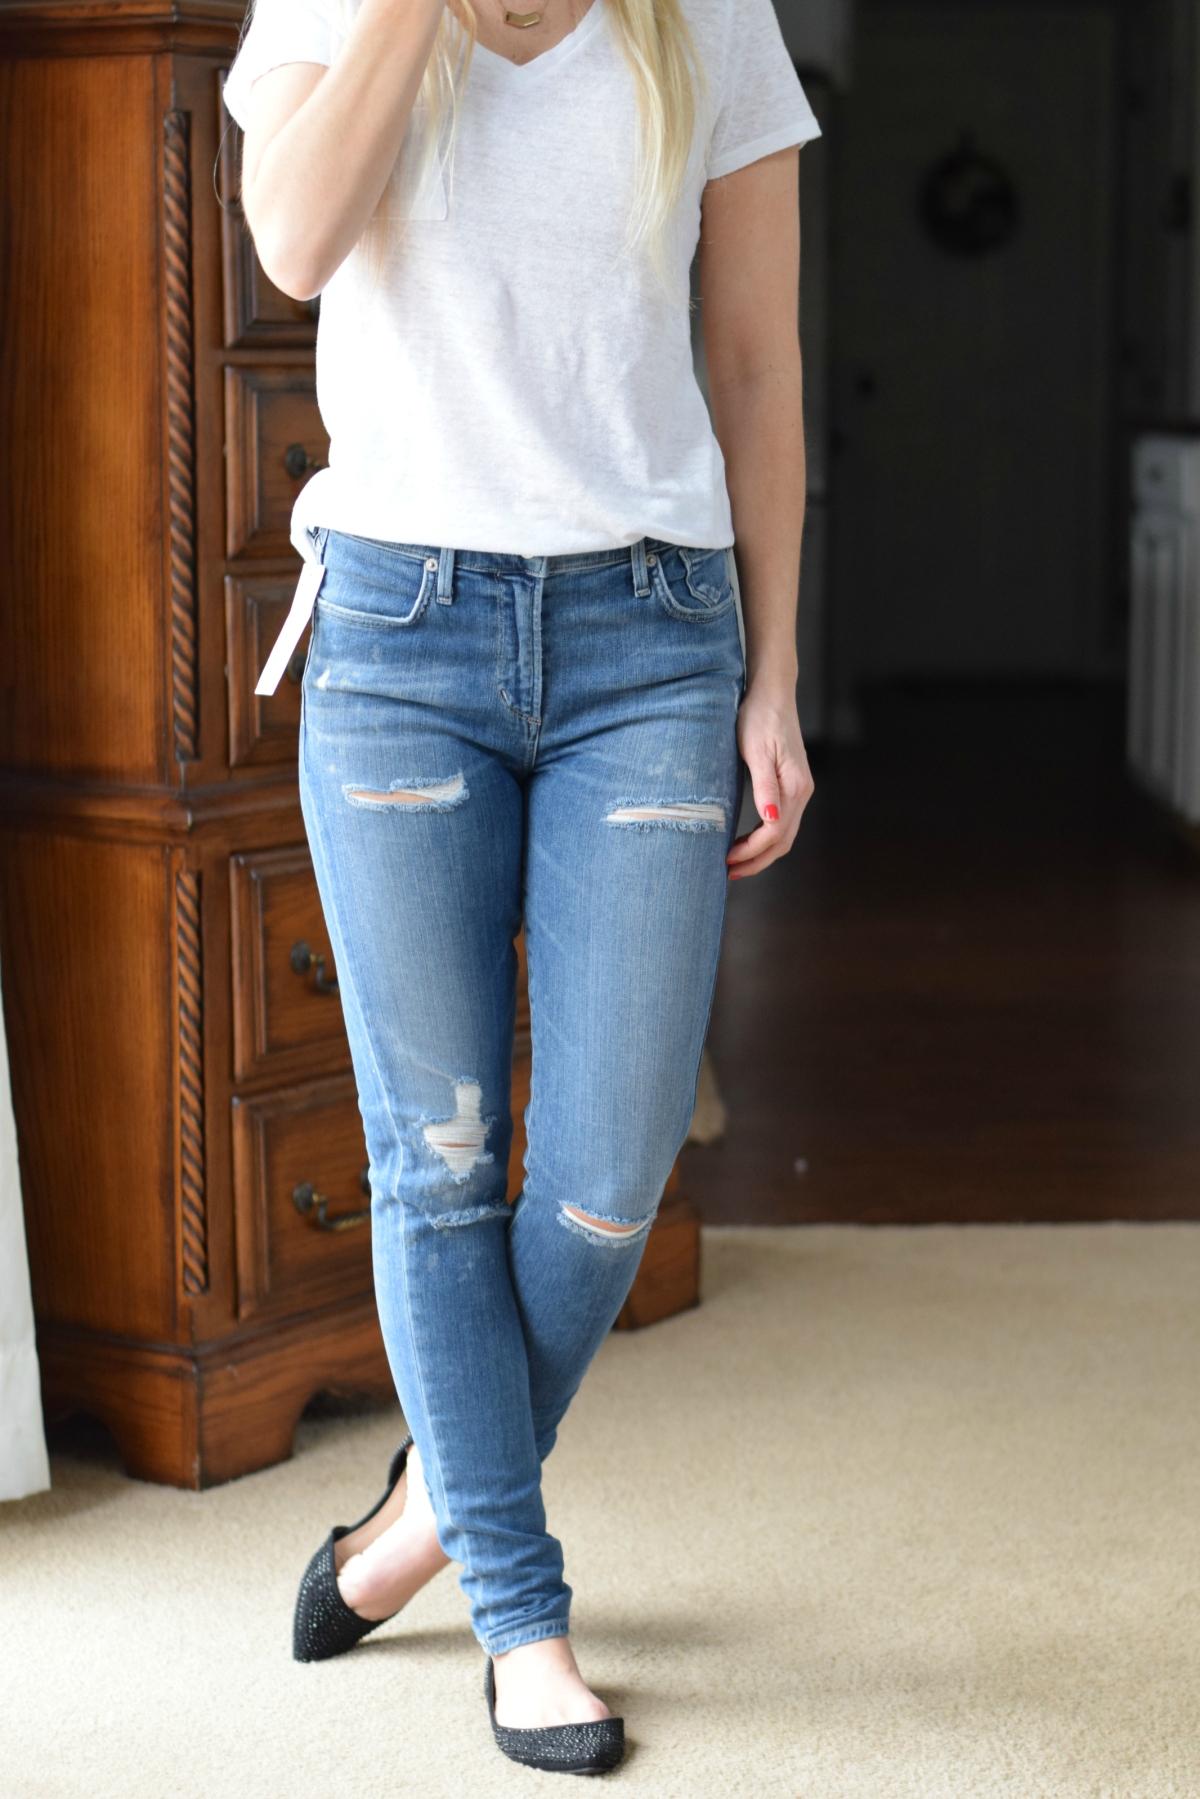 December 2015 Stitch Fix Review: A GOLD E Brynn Distressed High Rise Skinny Jean |www.pearlsandsportsbras.com|